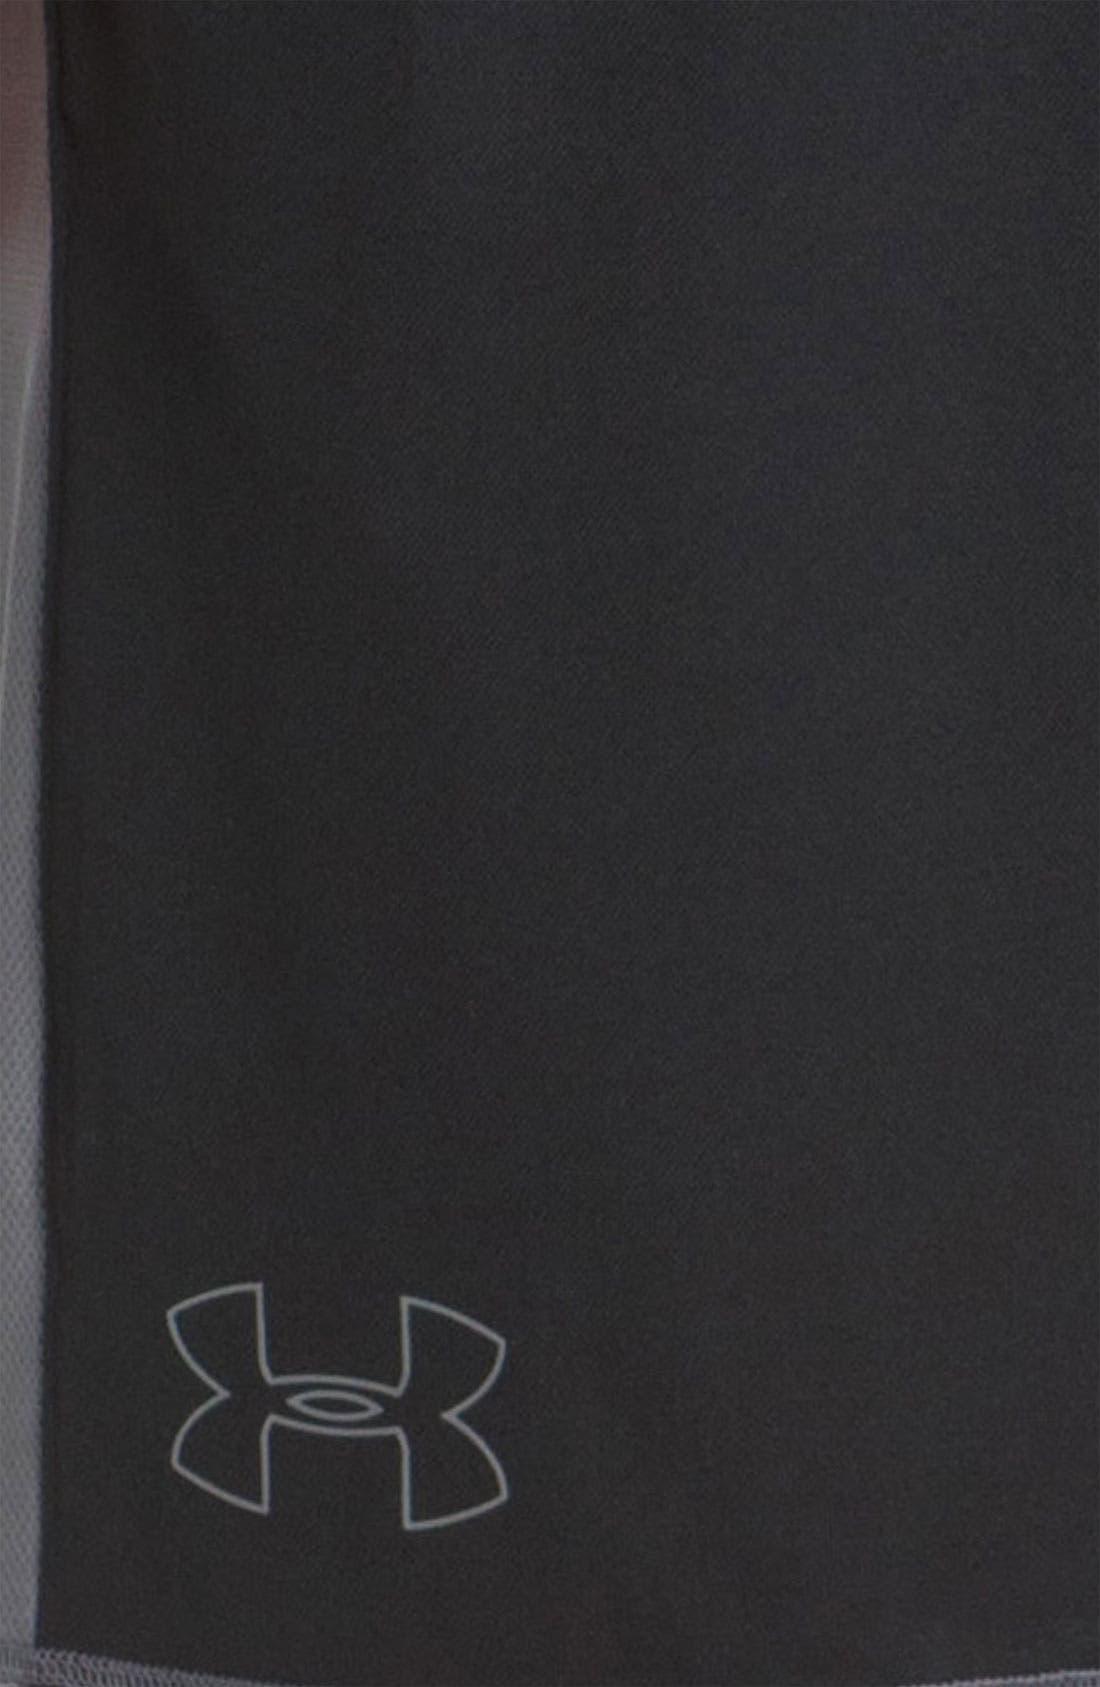 Alternate Image 2  - Under Armour 'Advent' HeatGear® Shorts